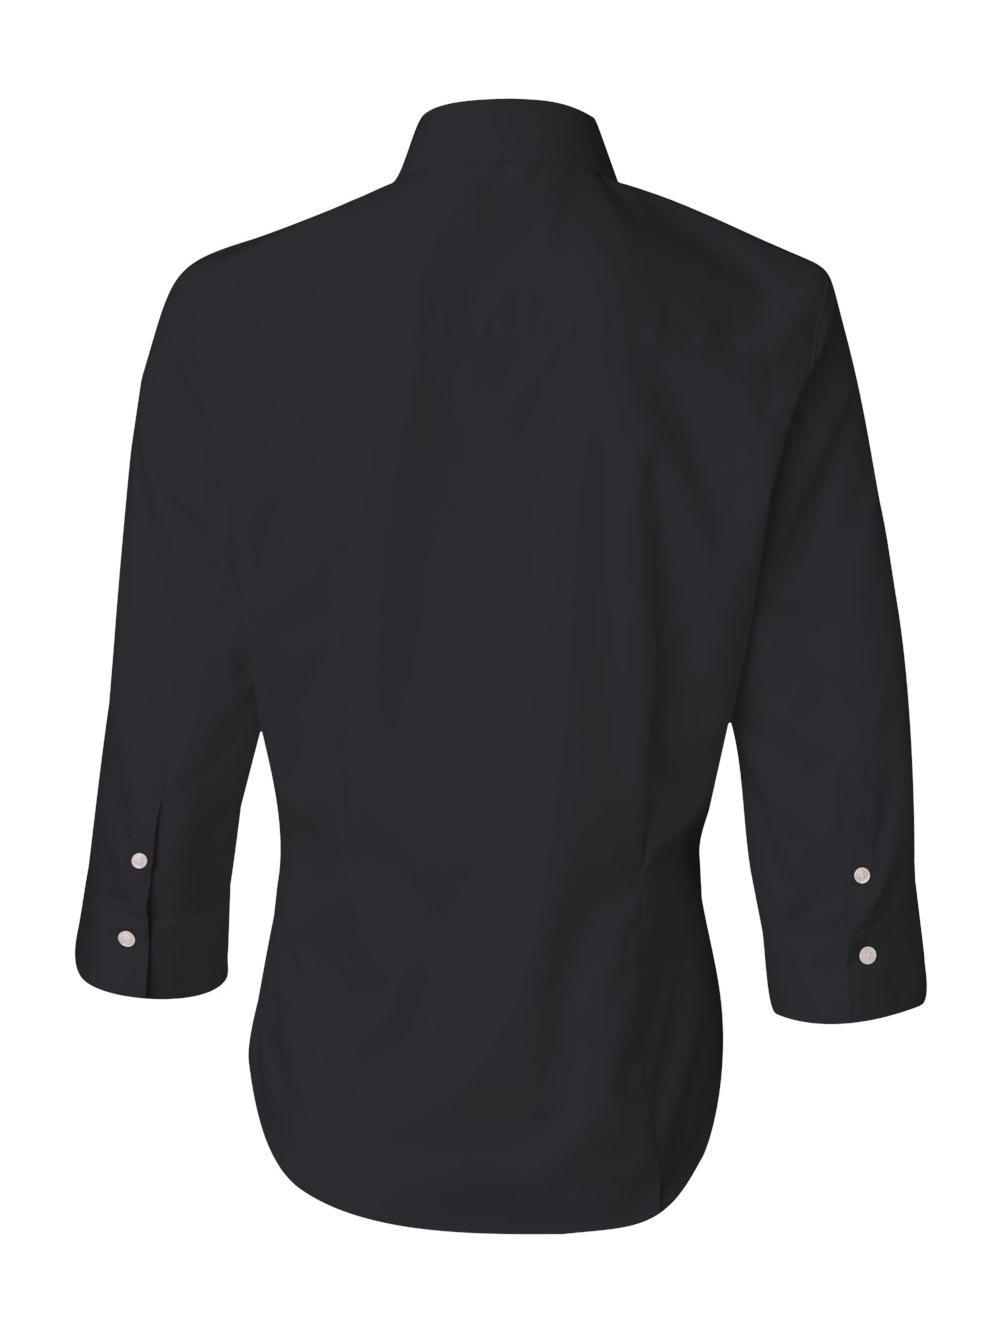 Van-Heusen-Women-039-s-Three-Quarter-Sleeve-Baby-Twill-Shirt-13V0527 thumbnail 4